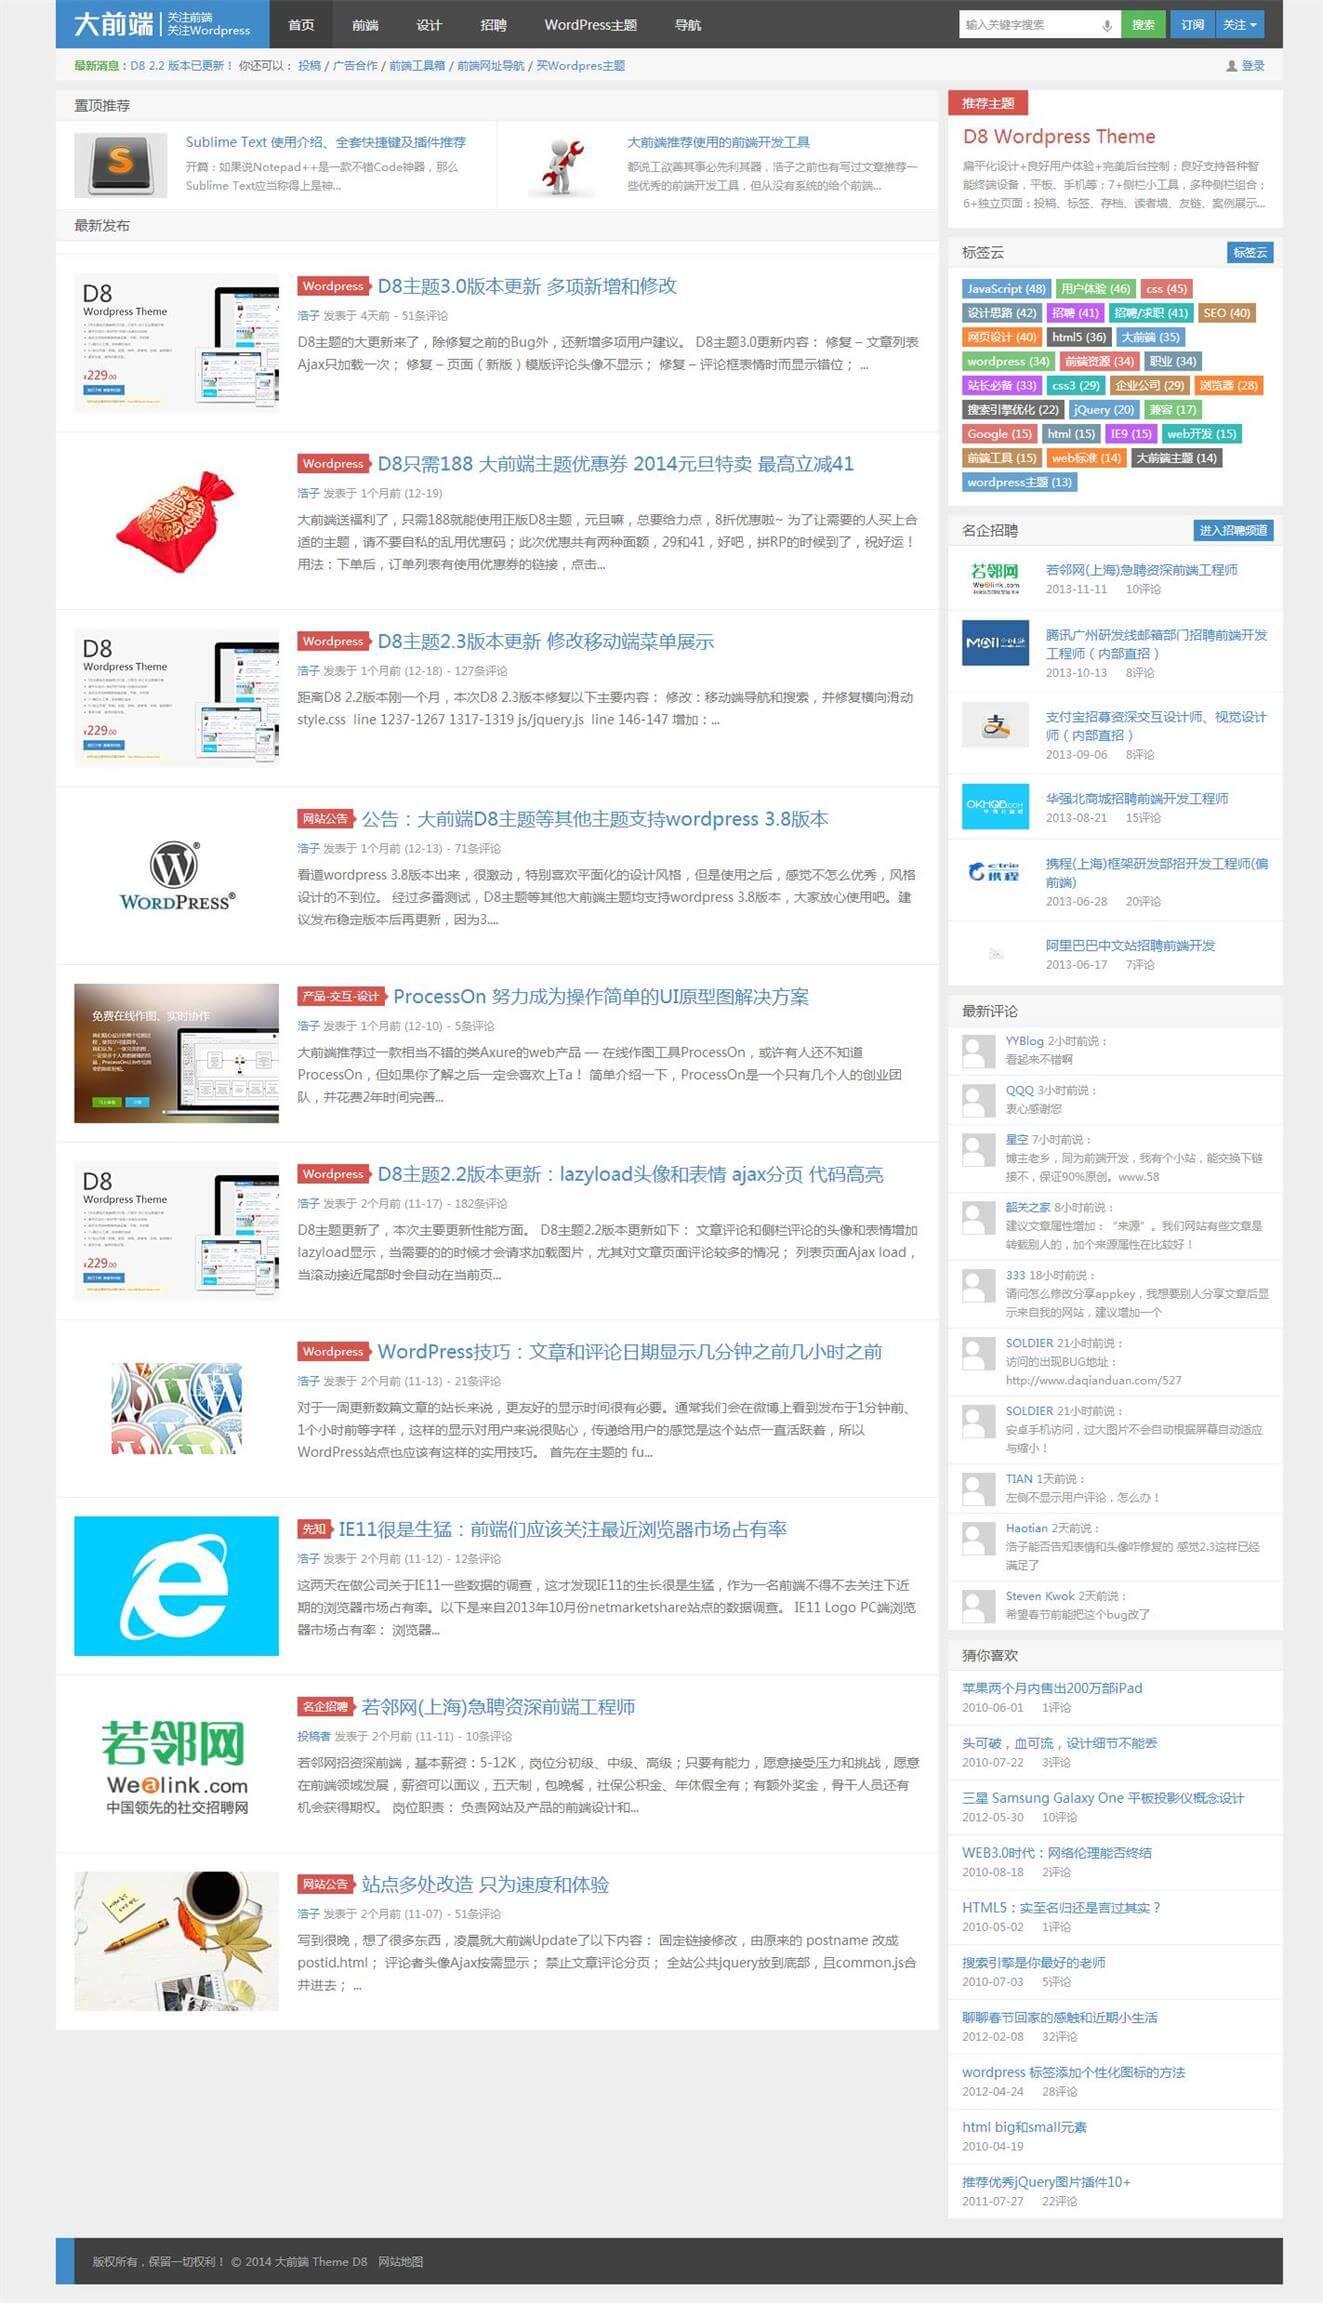 WordPress大前端D8 V3.0最新主题模板下载